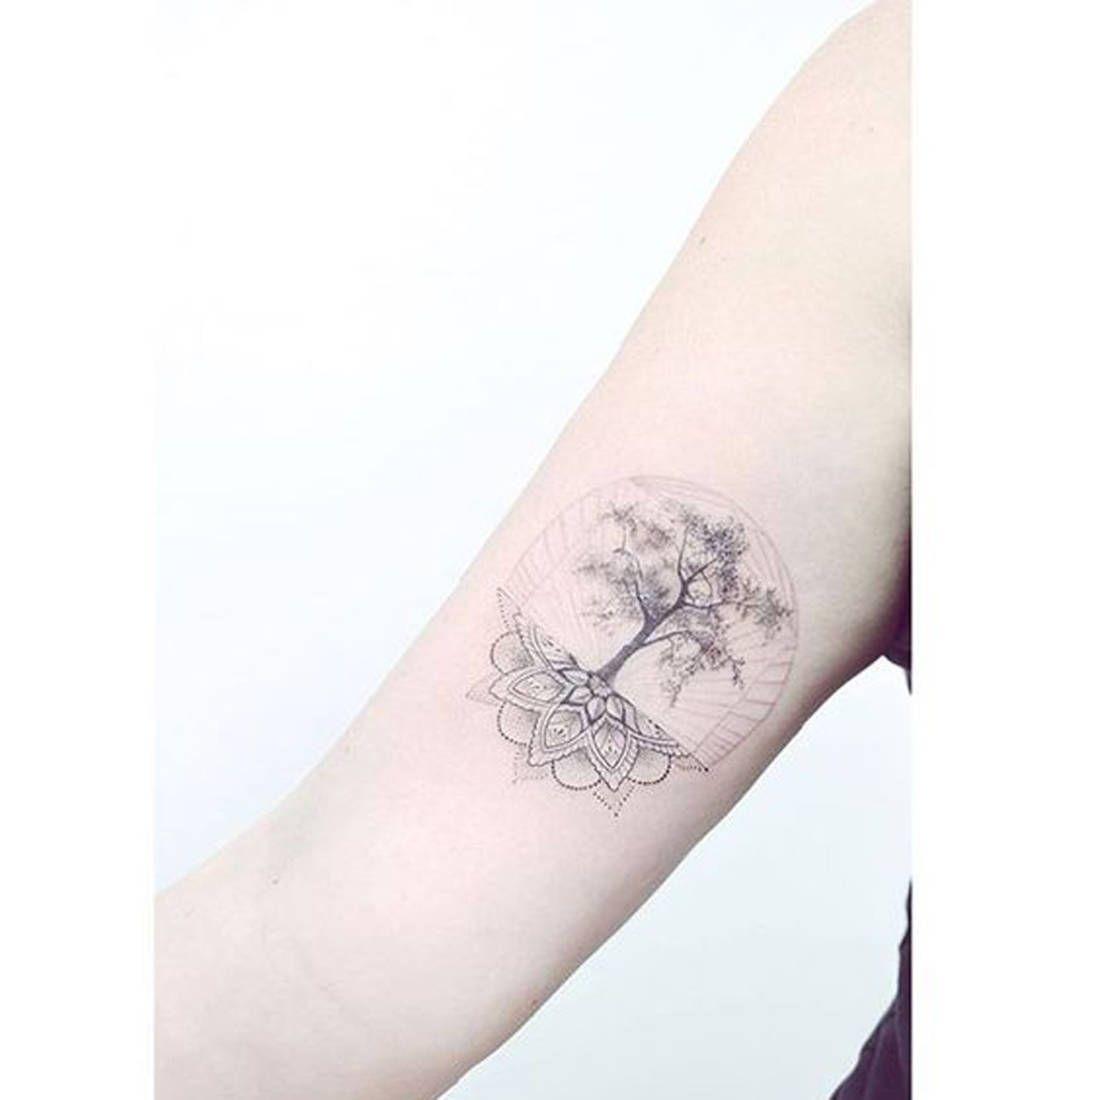 tatouage mandala arbre de vie tatouages tattoo. Black Bedroom Furniture Sets. Home Design Ideas